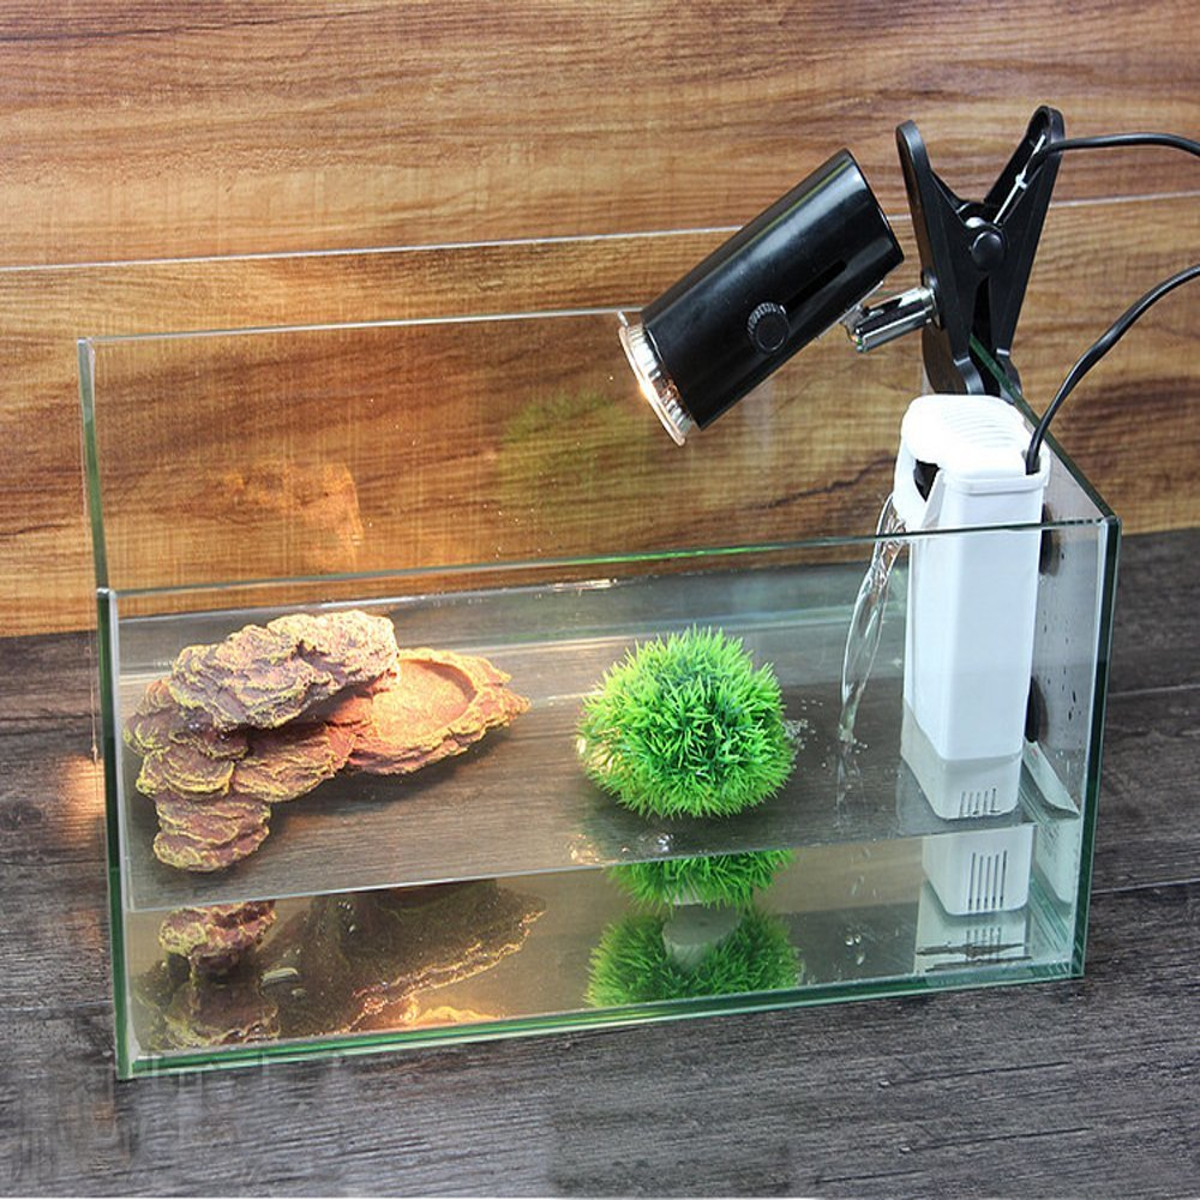 220V 3W Aquarium Internal Filter Water Pump Turtle Kit Fish Tanks Wall Suction Cup Filter Purifier Aquarium Terrarium Filter